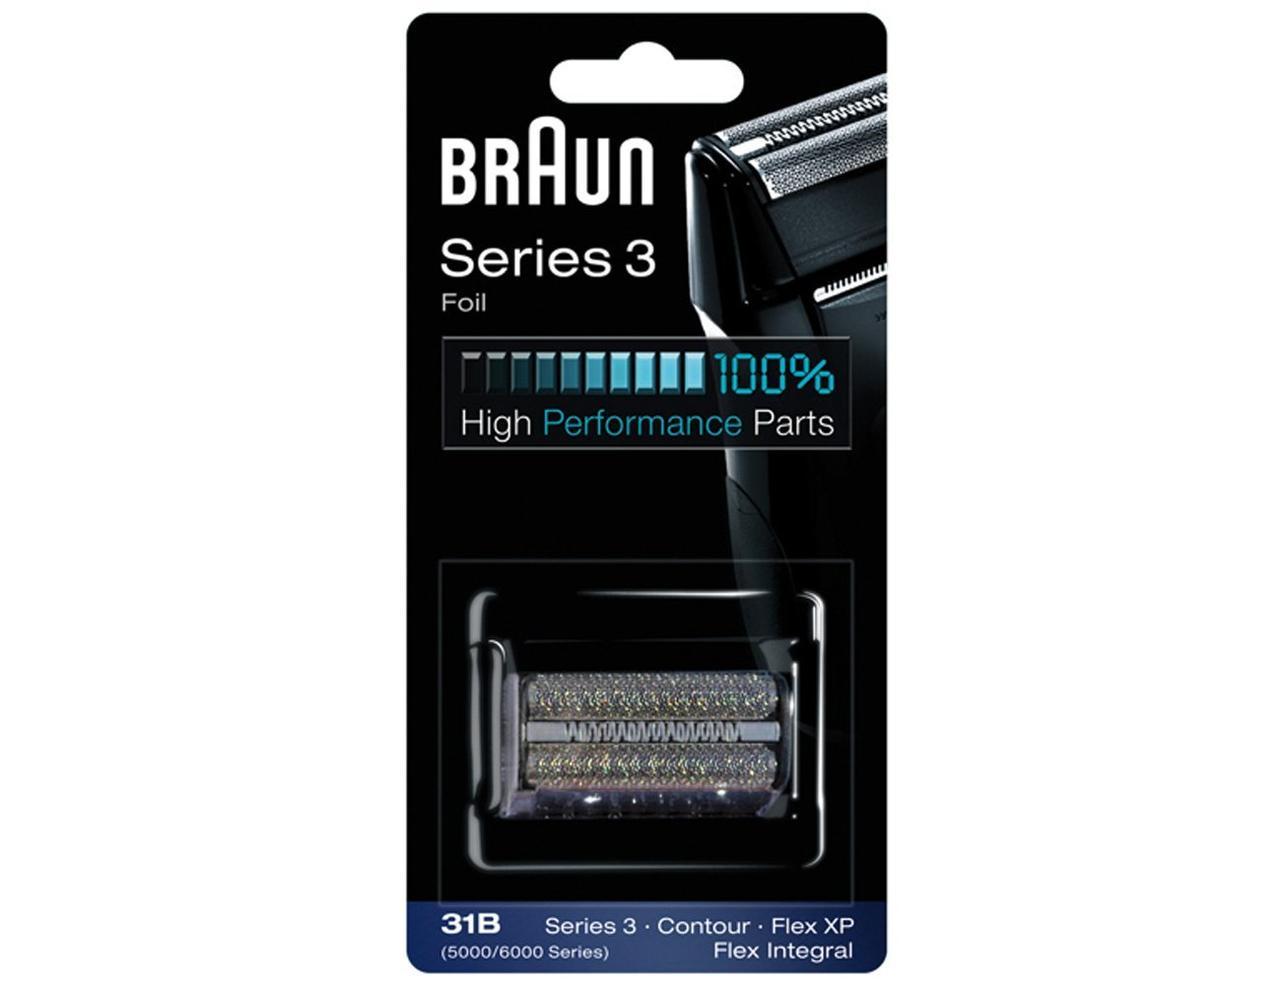 Насадка сетка для бритвы 31B - Braun Series 3